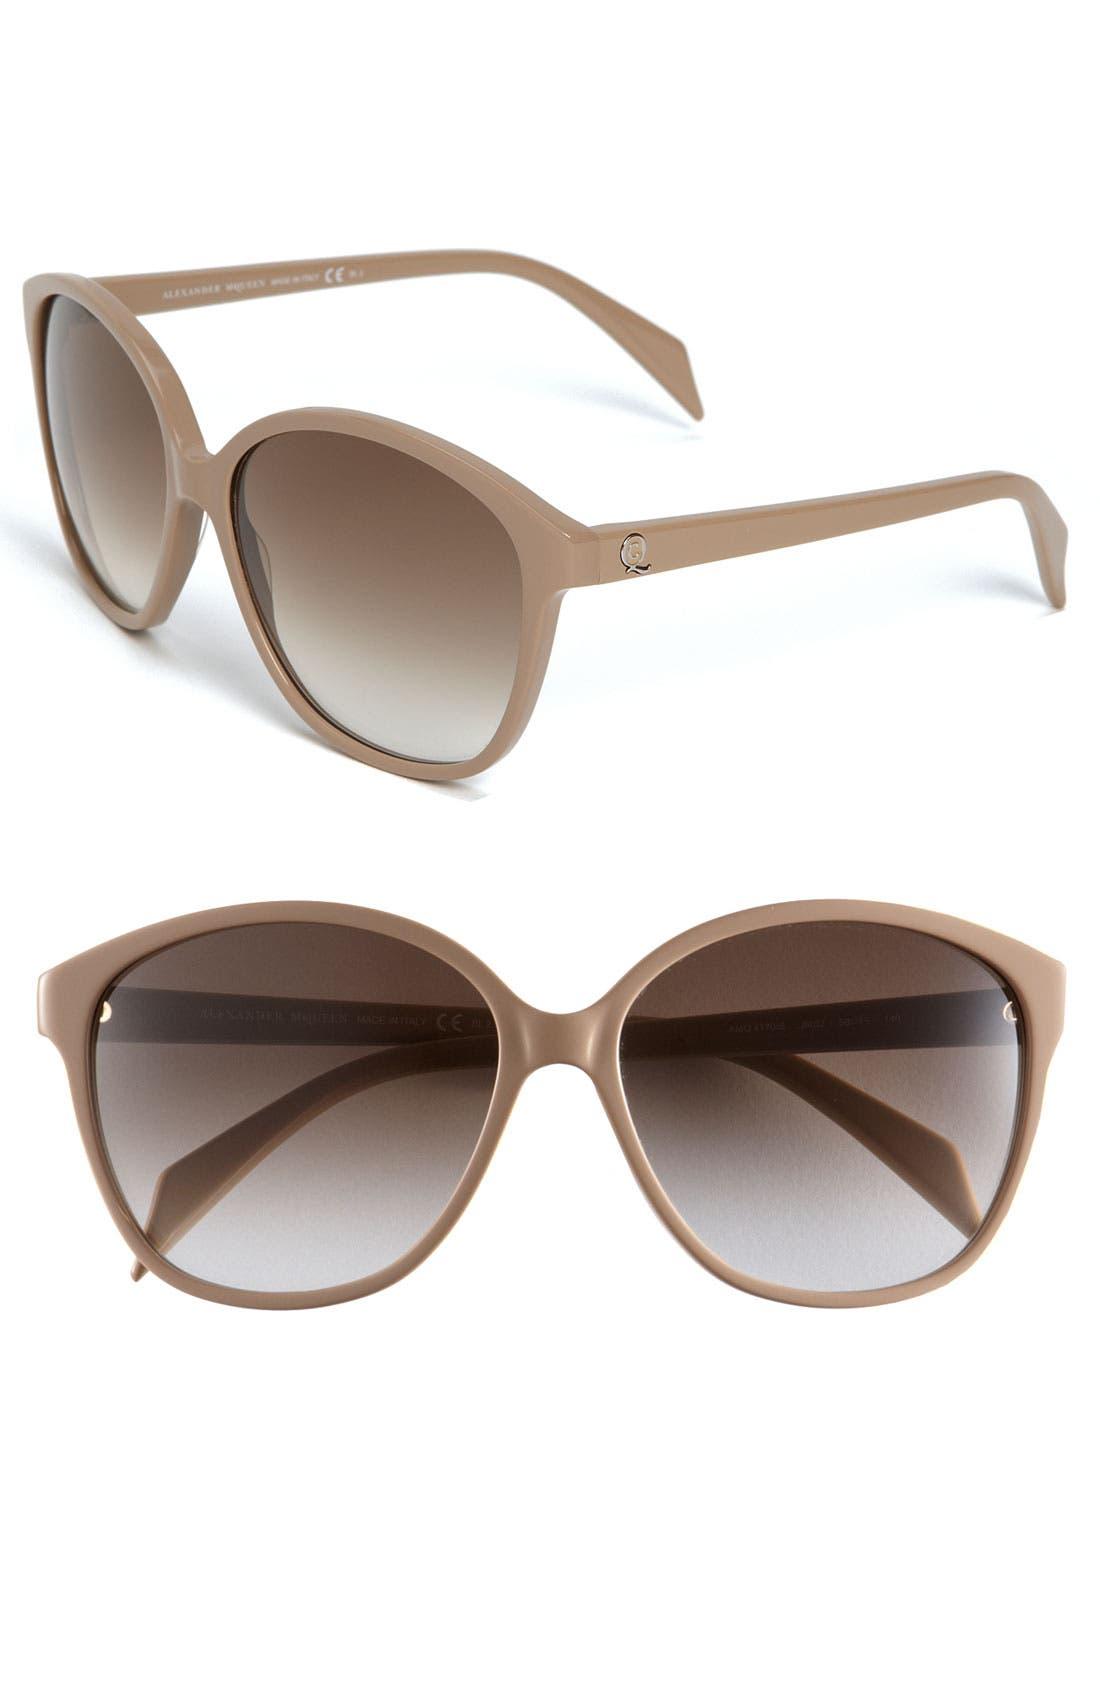 Main Image - Alexander McQueen Retro Inspired Sunglasses